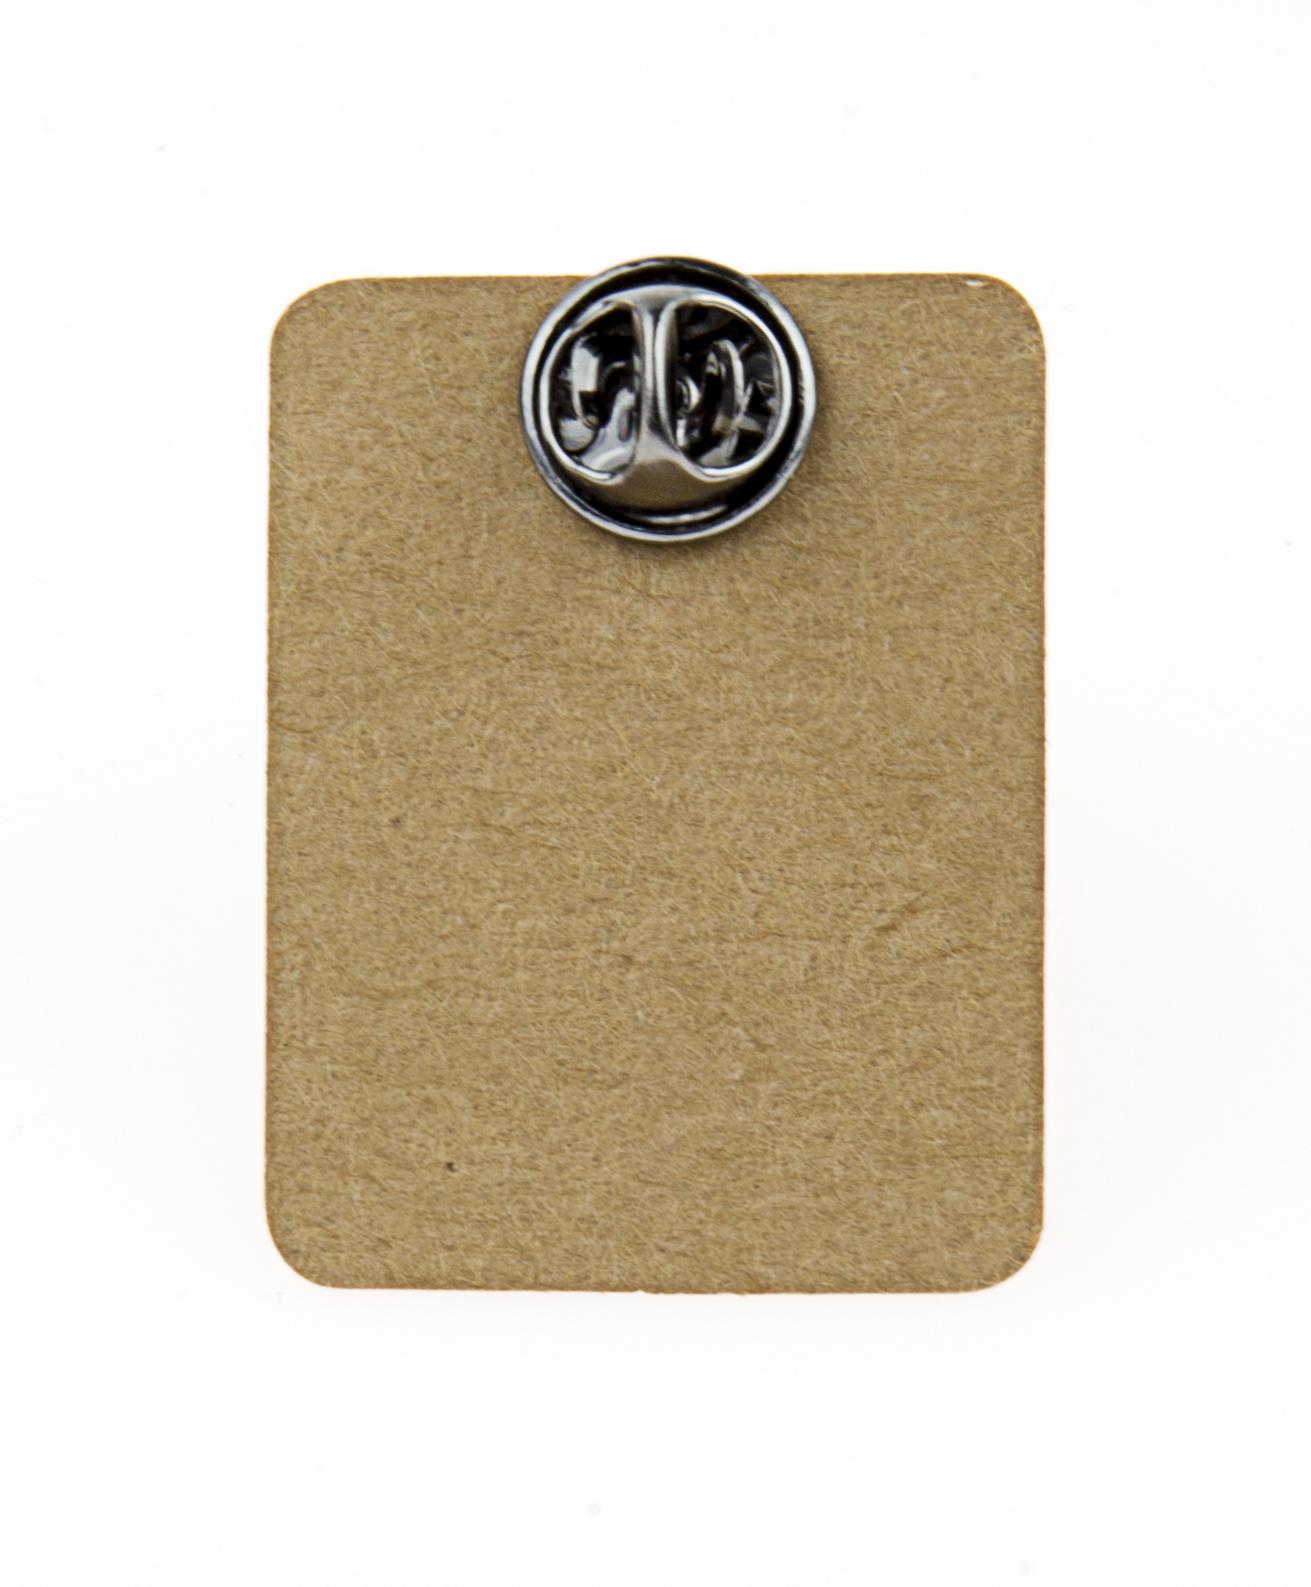 Metal Red Apple OK Enamel Pin Badge